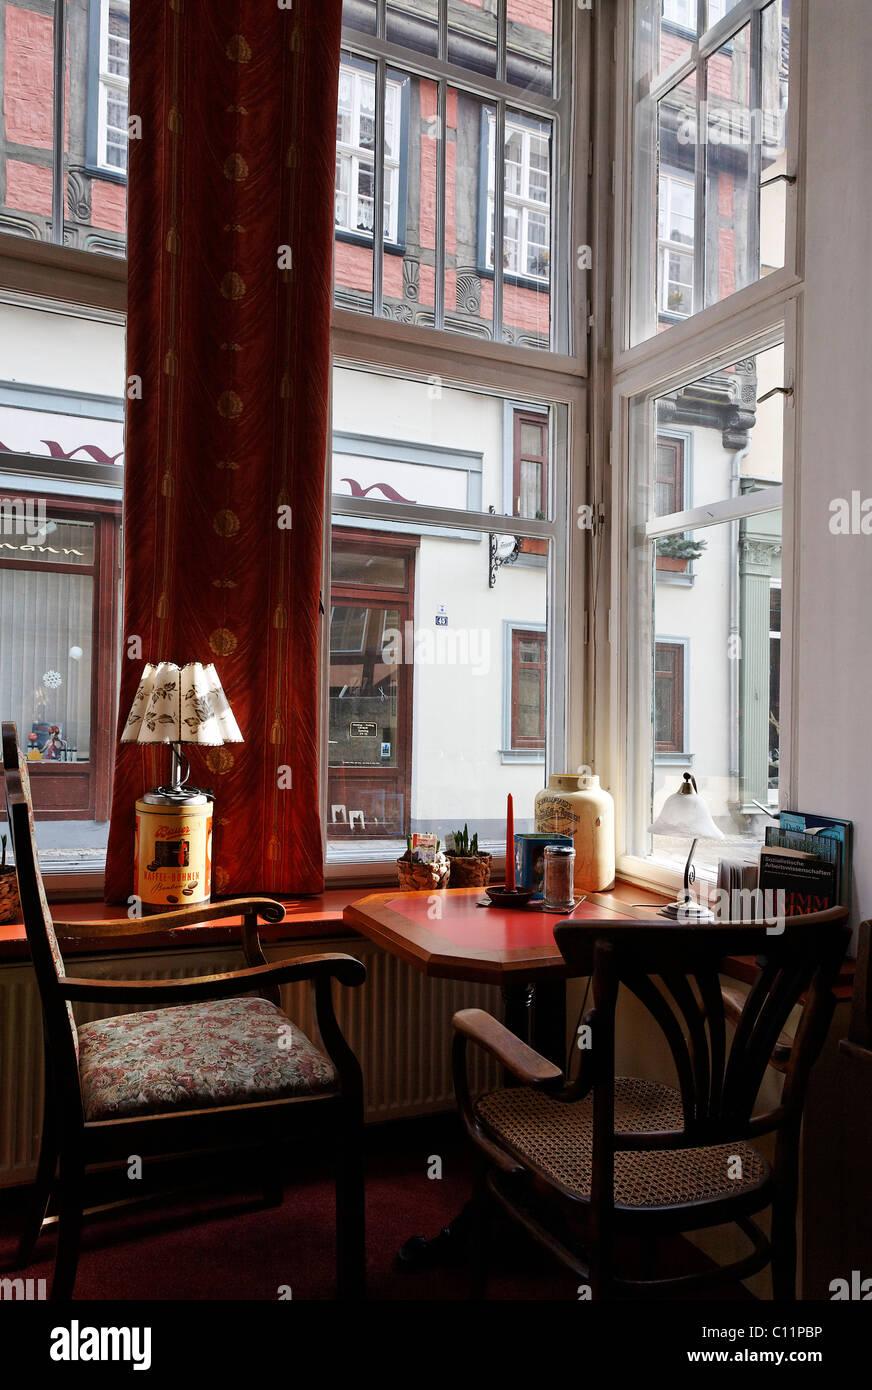 roland cafe stock photos roland cafe stock images alamy. Black Bedroom Furniture Sets. Home Design Ideas